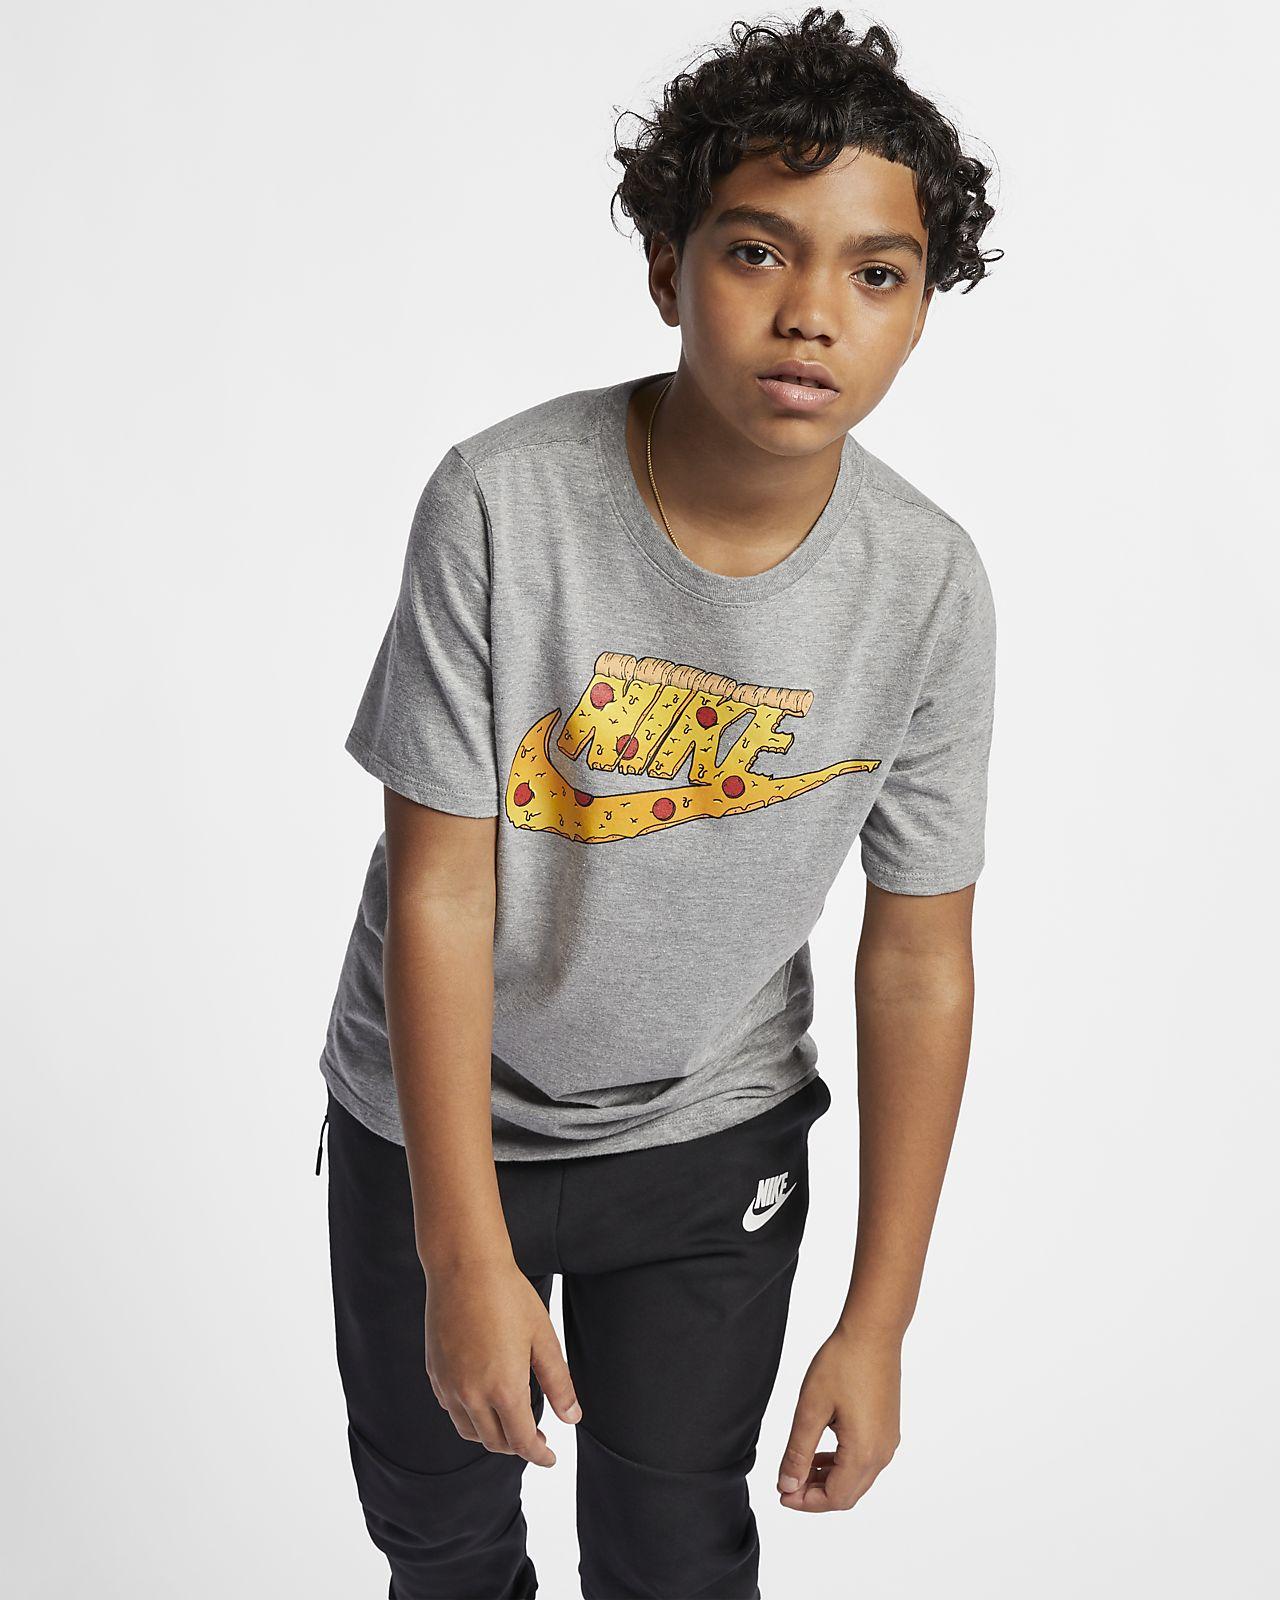 941d48e5 Nike Sportswear Big Kids' T-Shirt. Nike.com